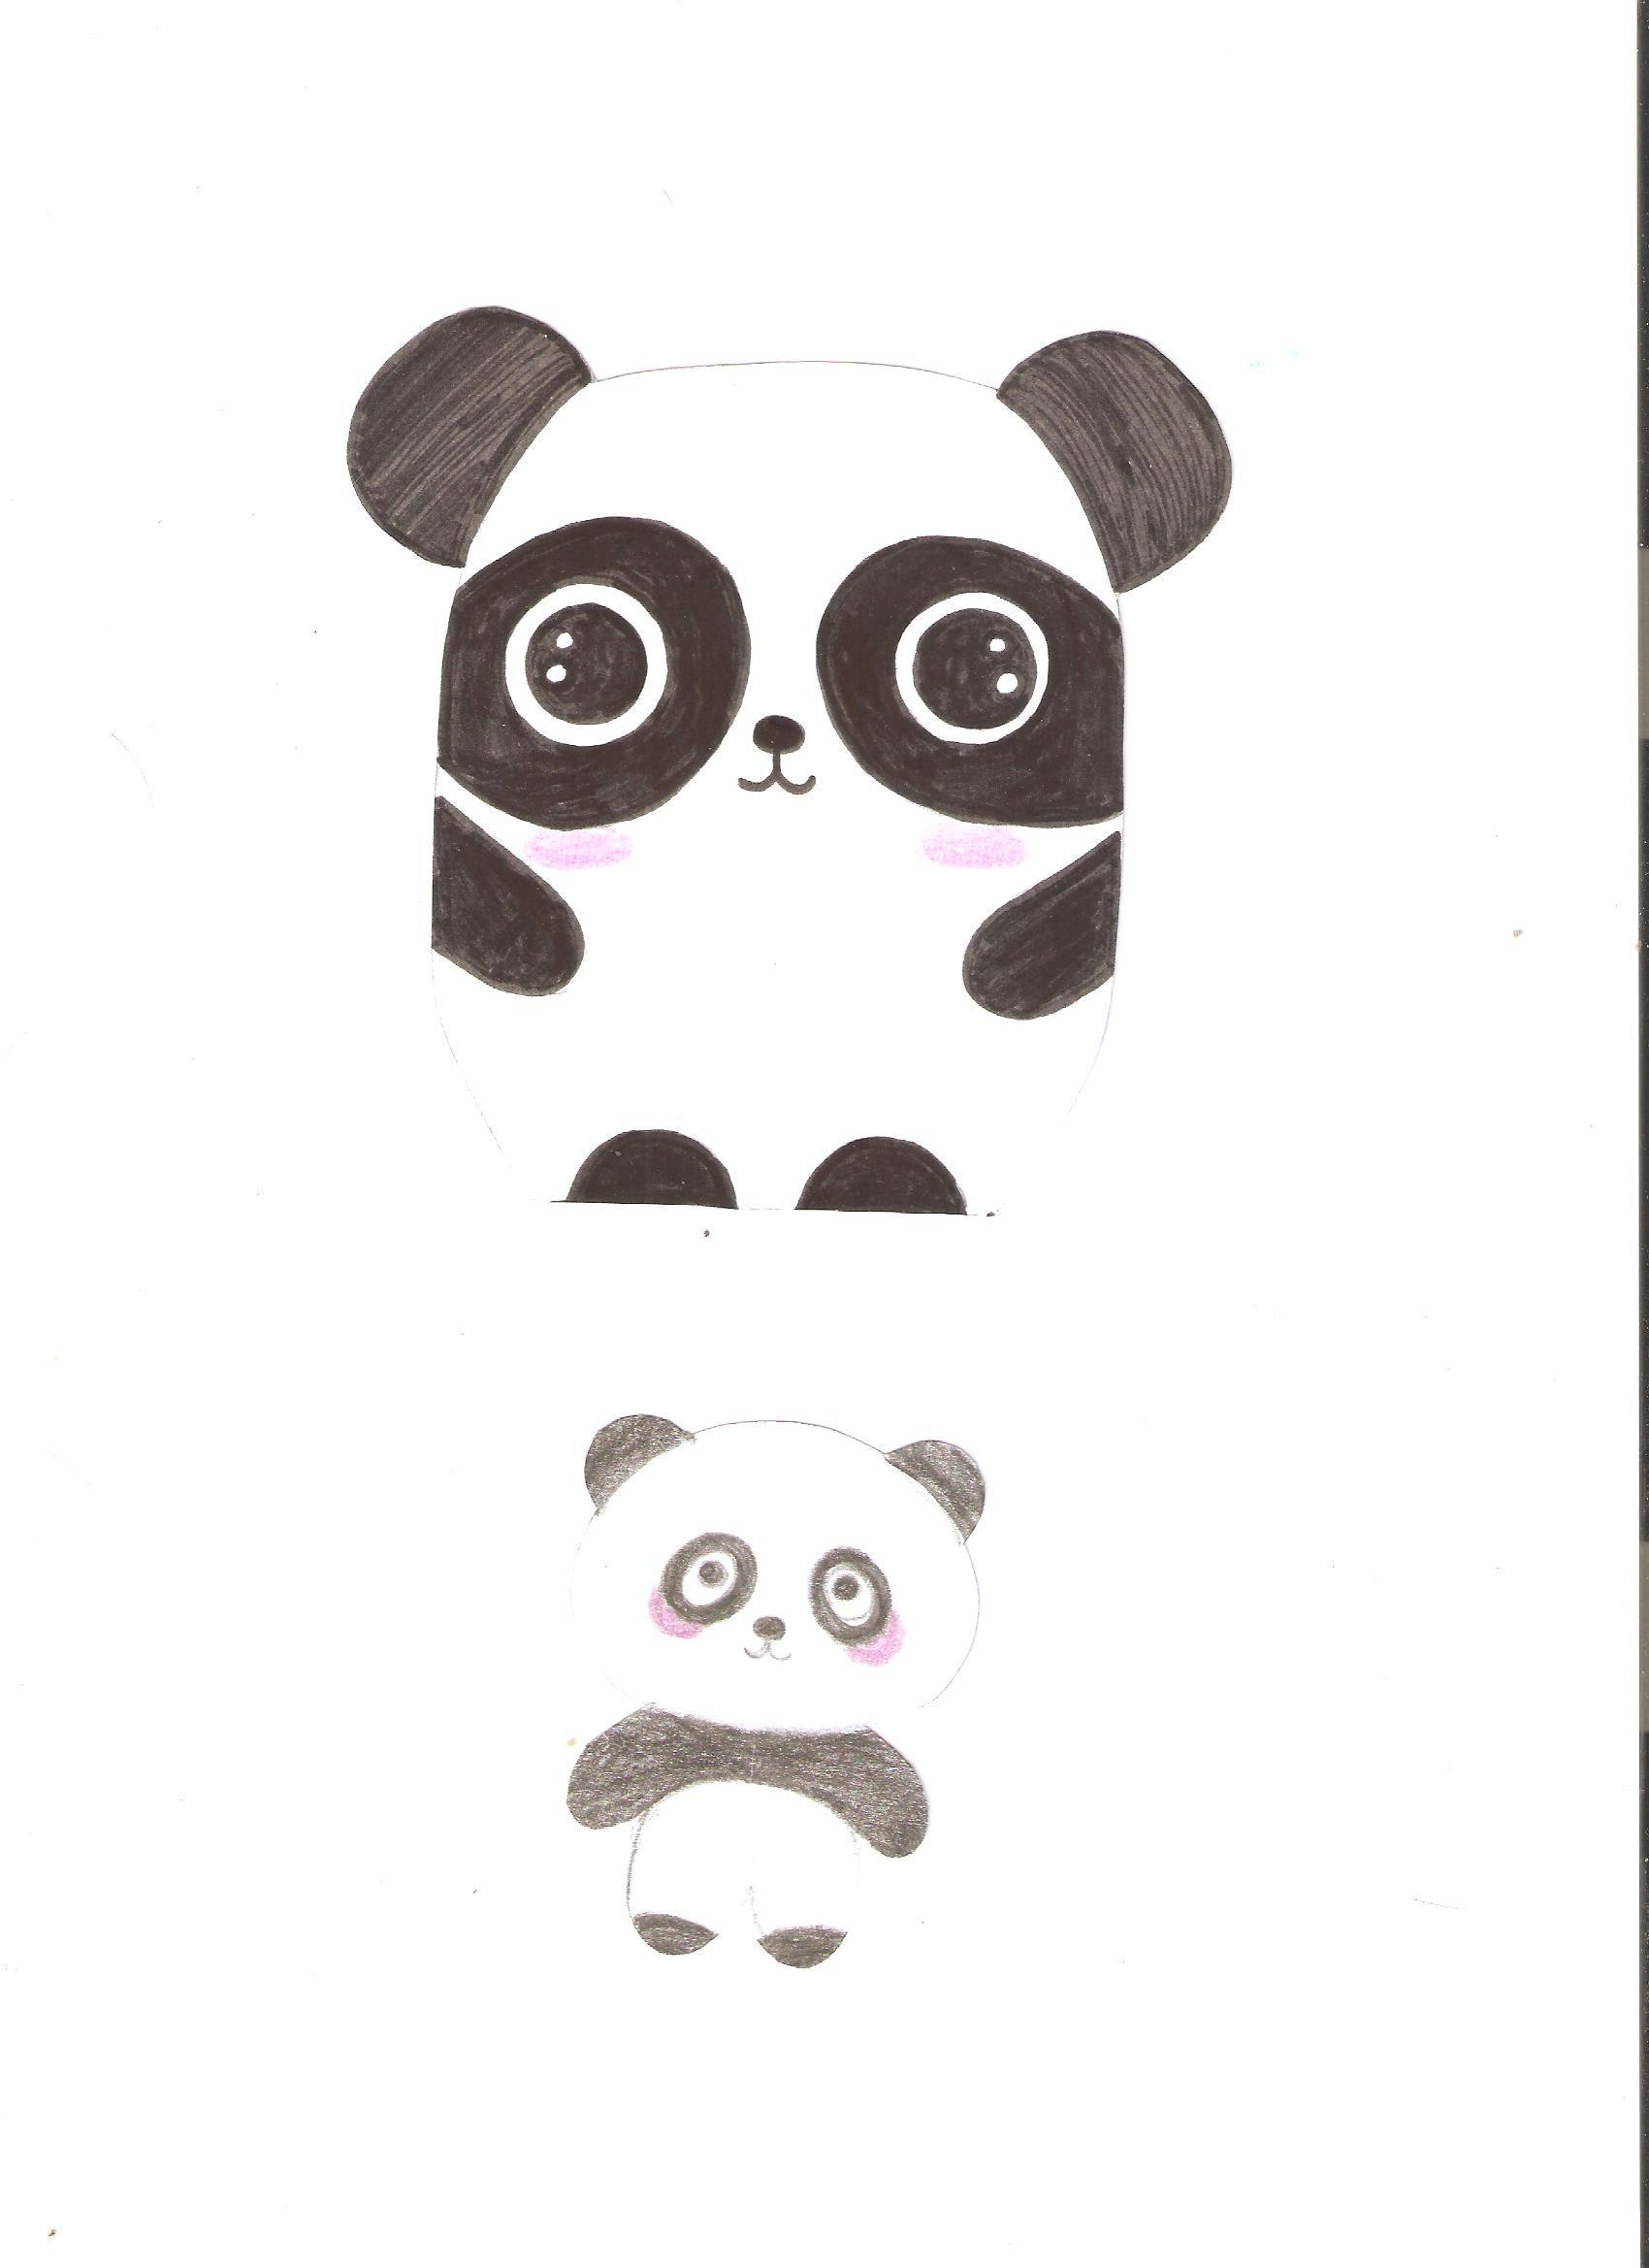 Pin de Michele Christensen en I can make that!!! :) | Pinterest ...